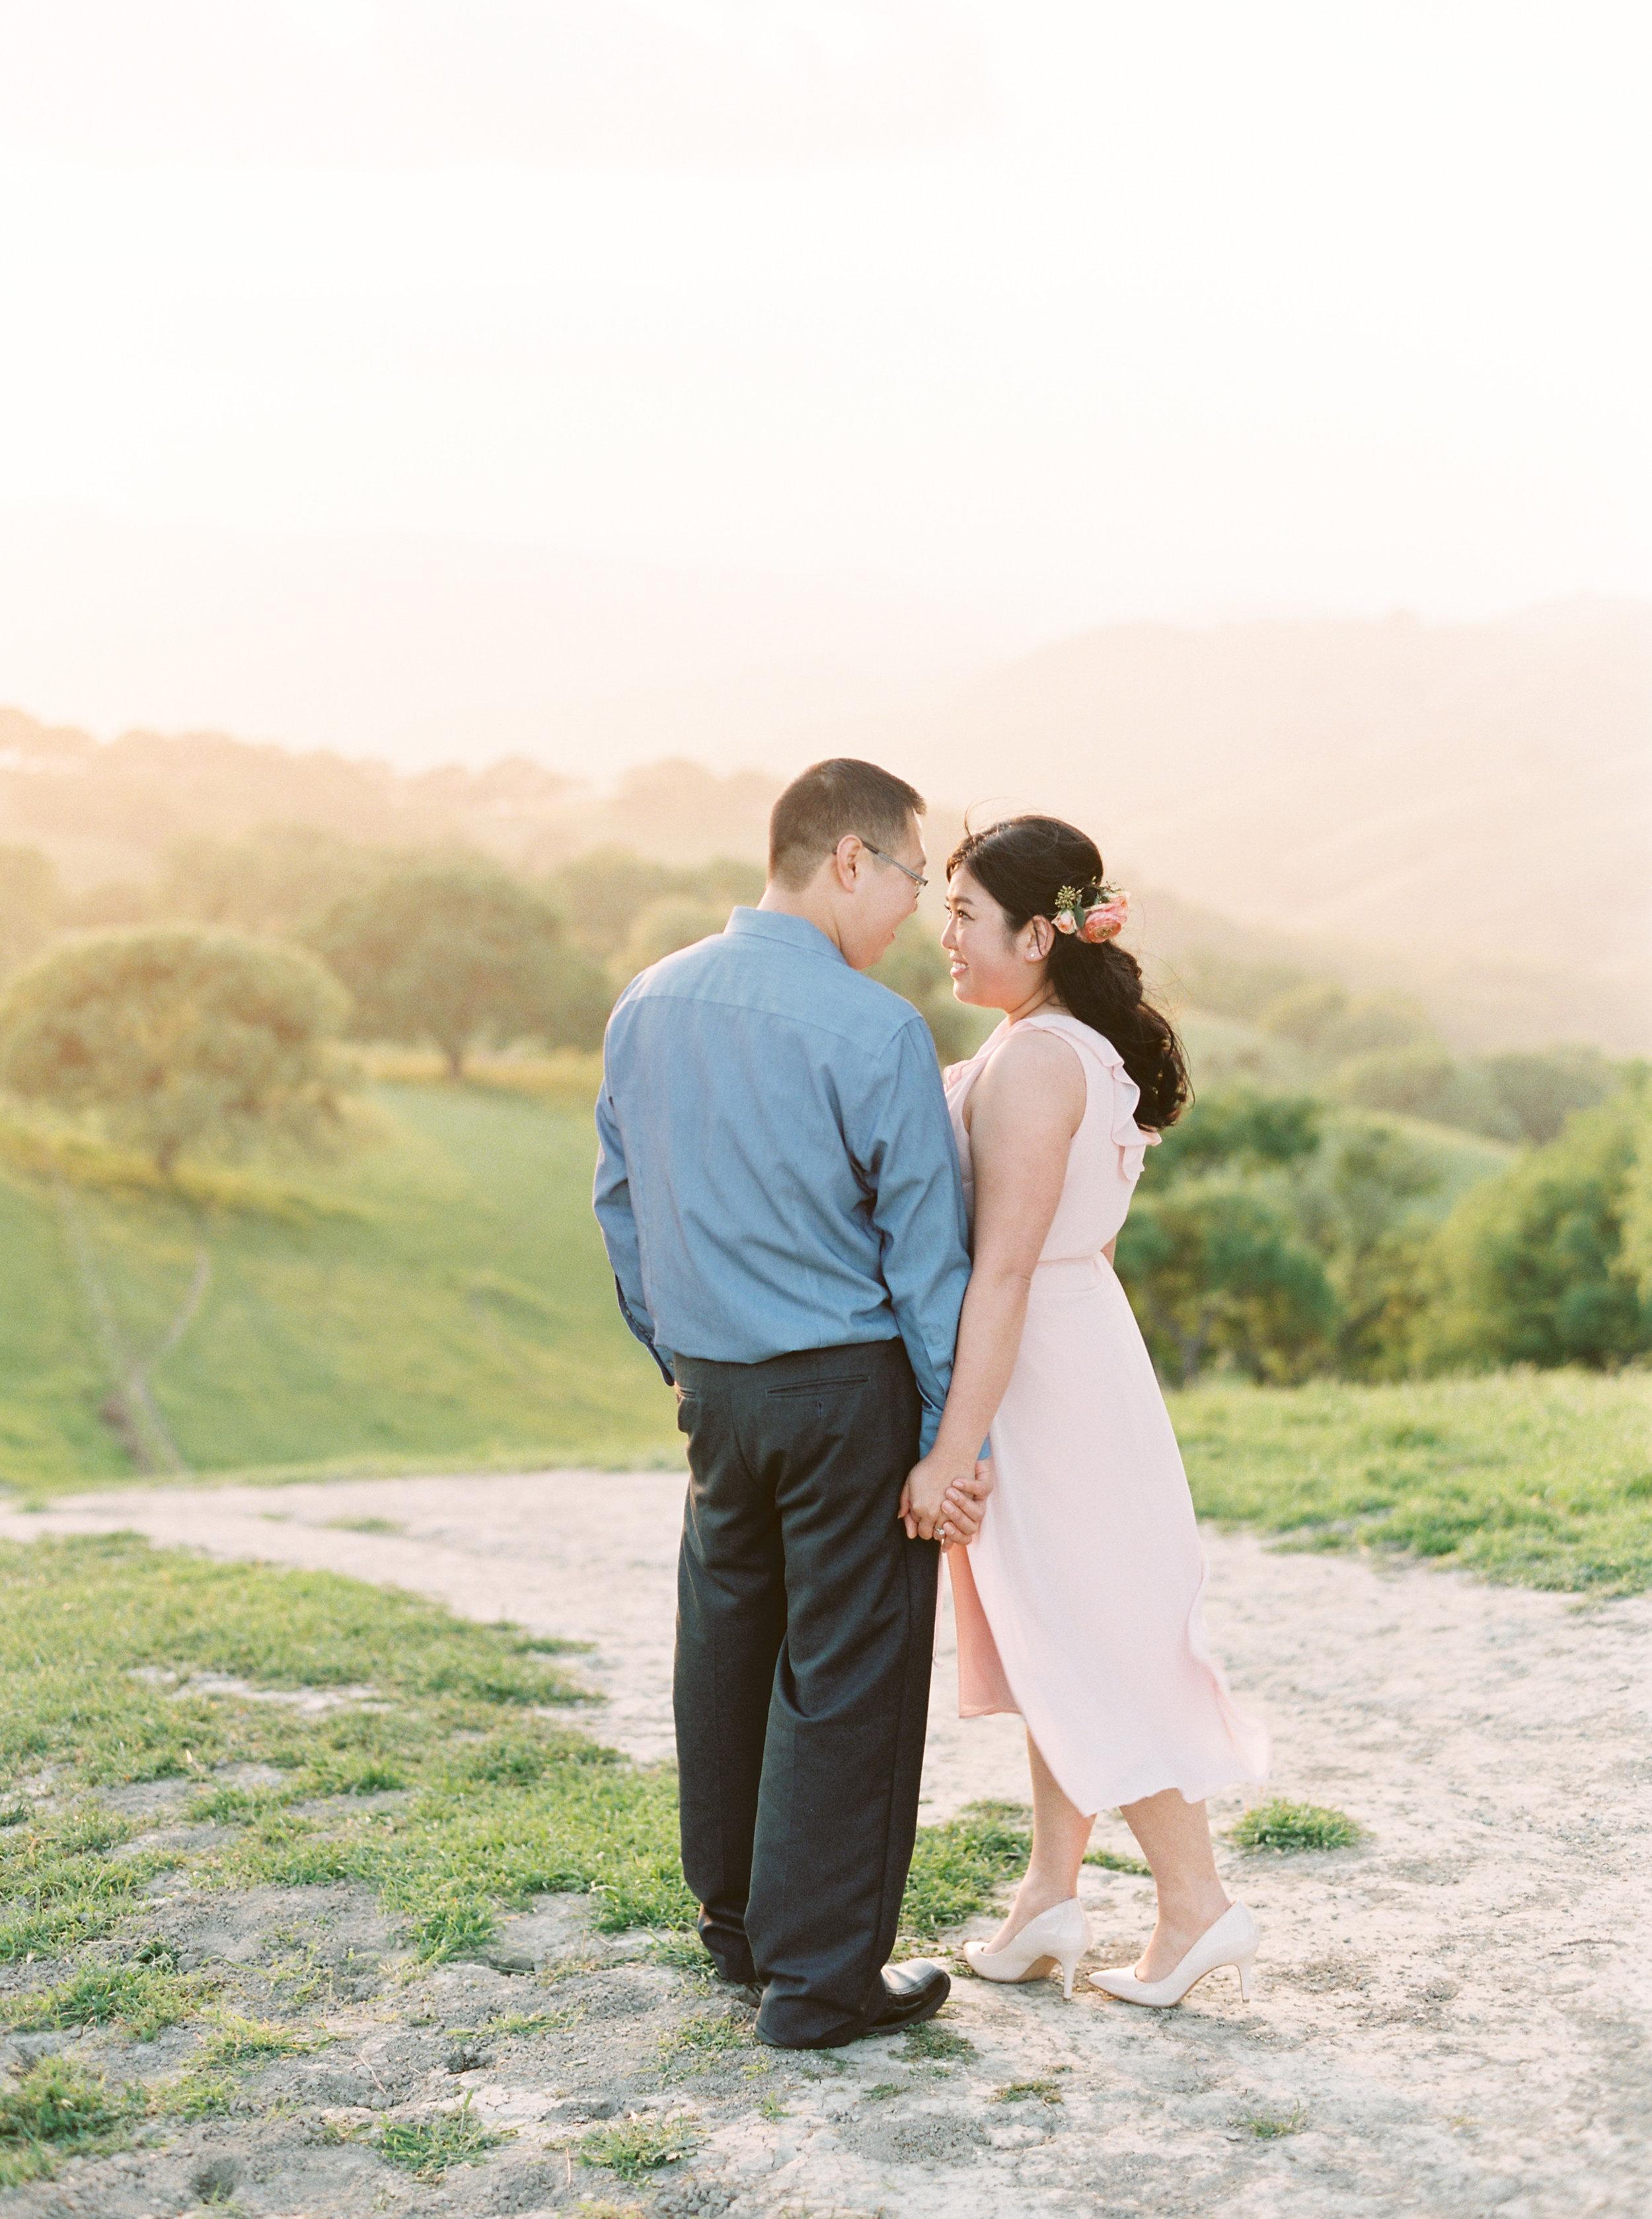 del-valle-livermore-bay-area-wedding-photographer-35.jpg